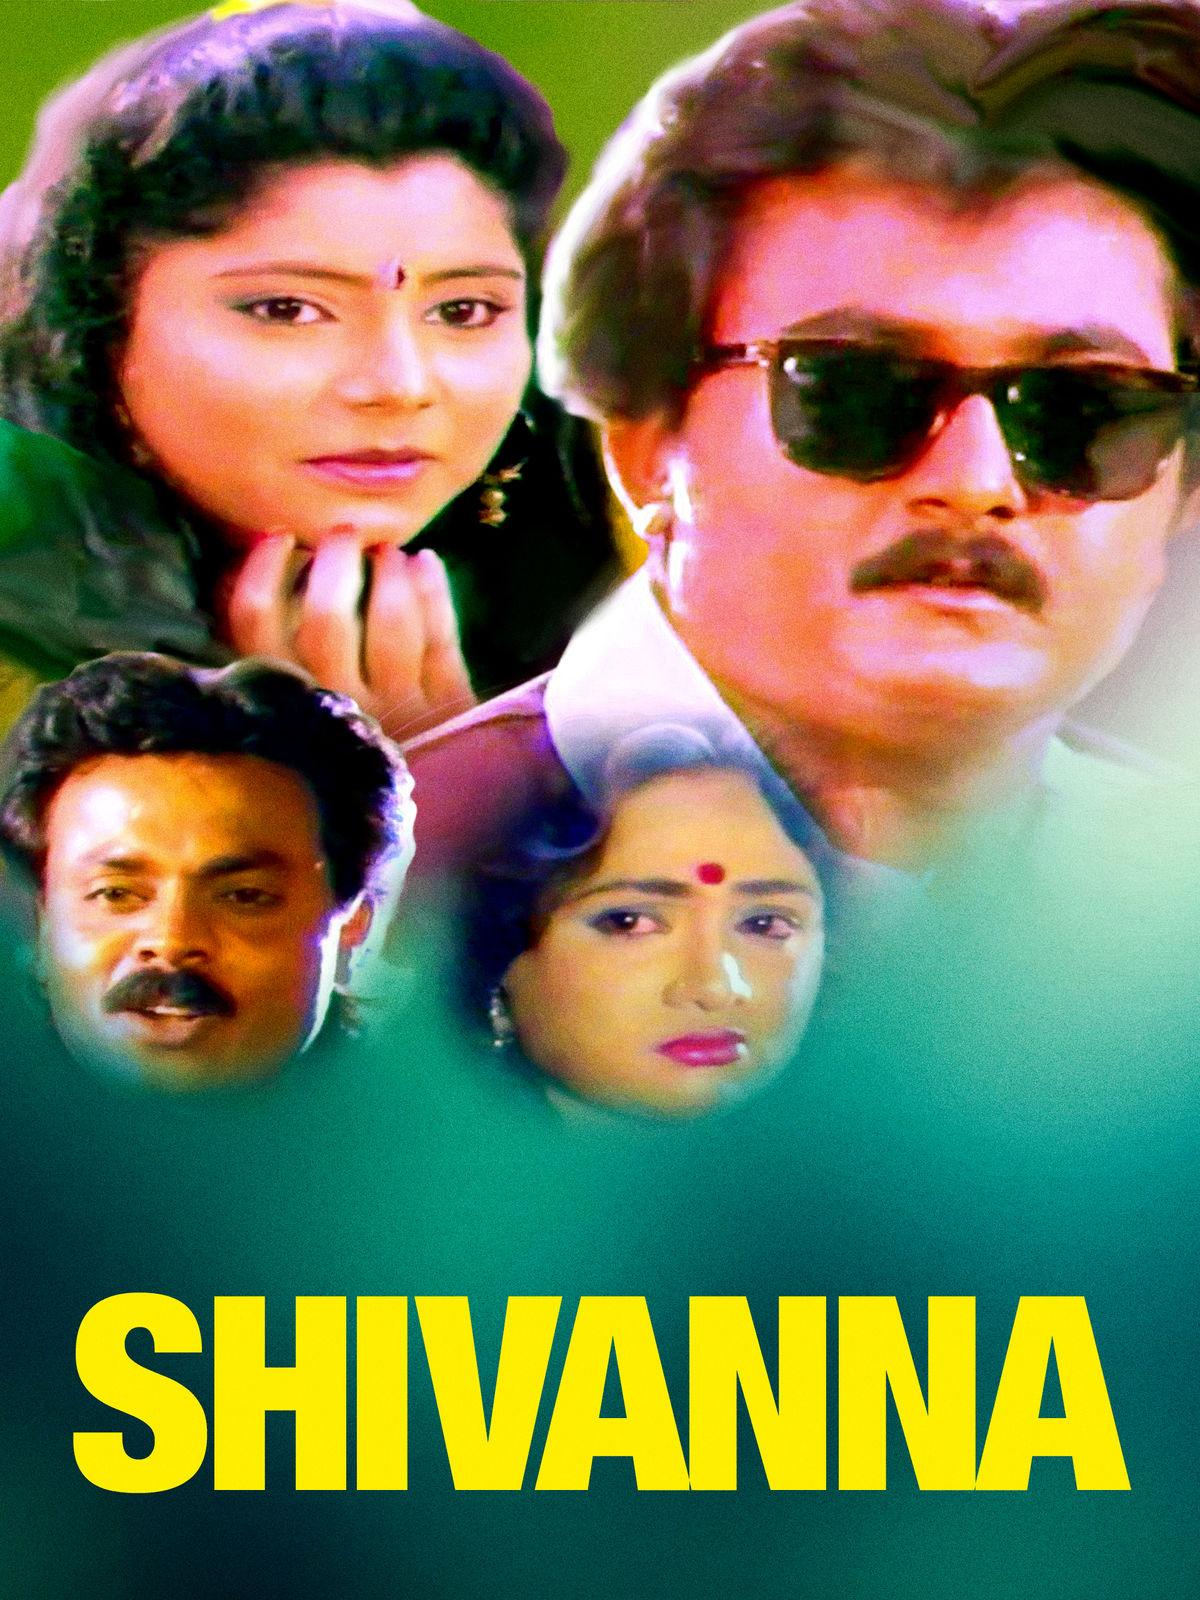 Shivanna